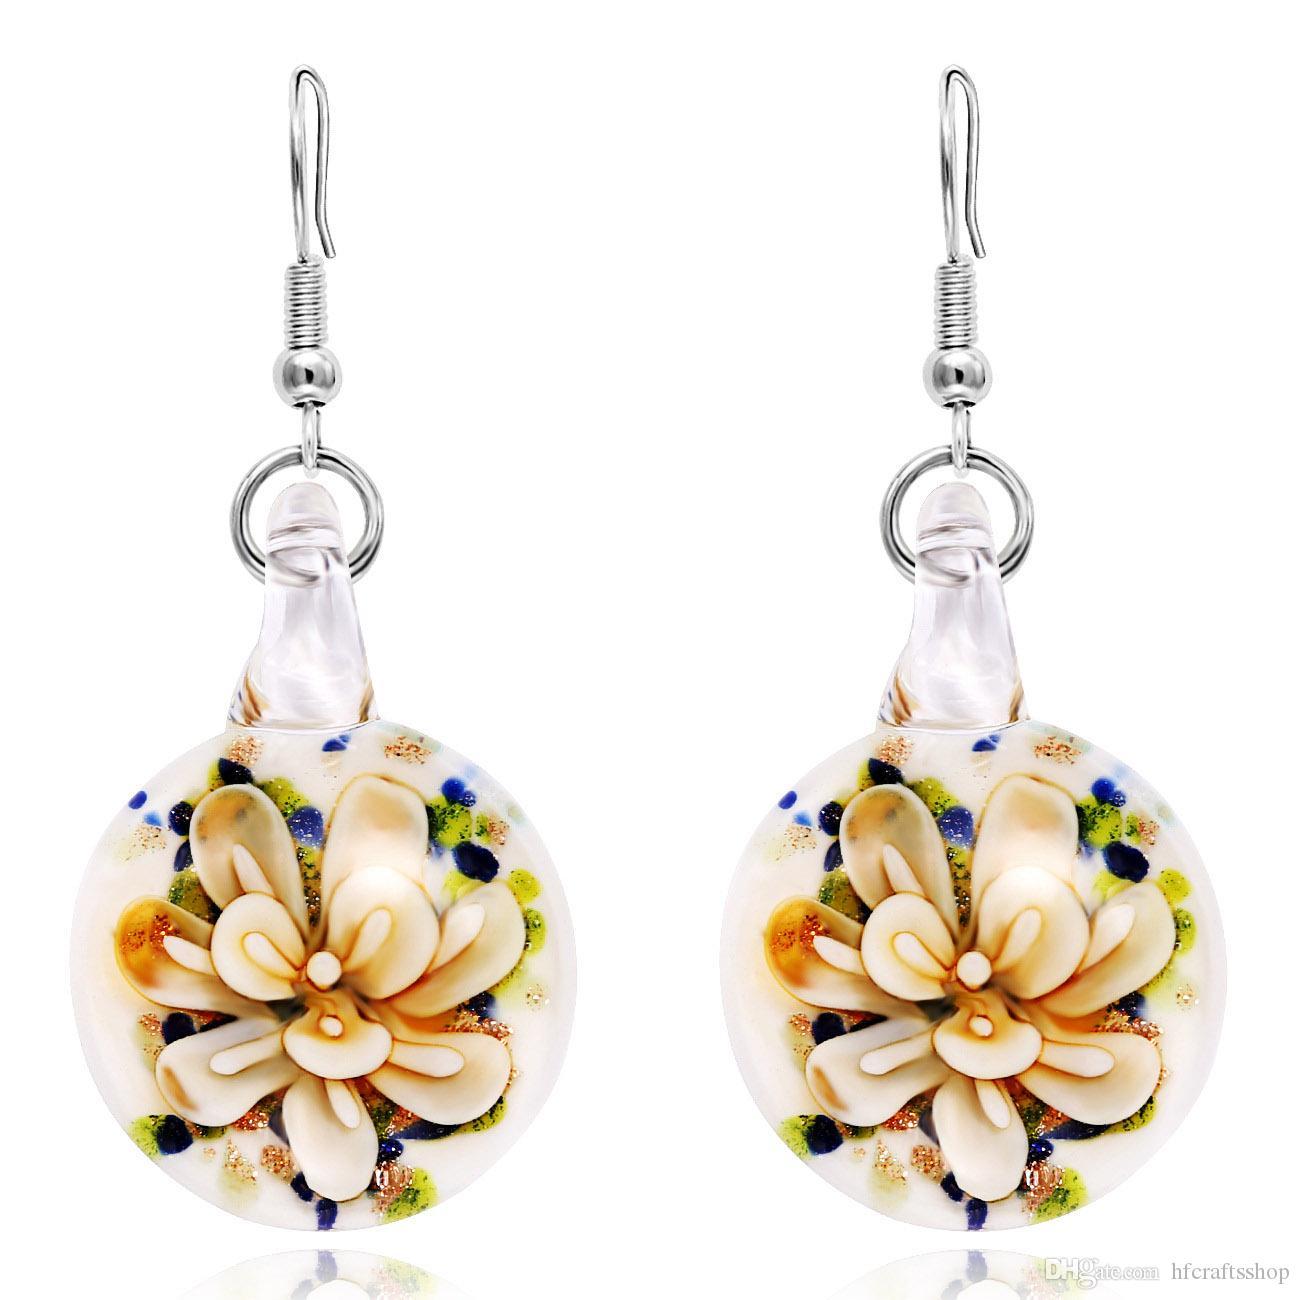 10pcs Colorful Round Murano Glass Pendant Drop Earrings Bohemia Dangle Earring Fashion Jewelry For Women Wedding Party Accessory